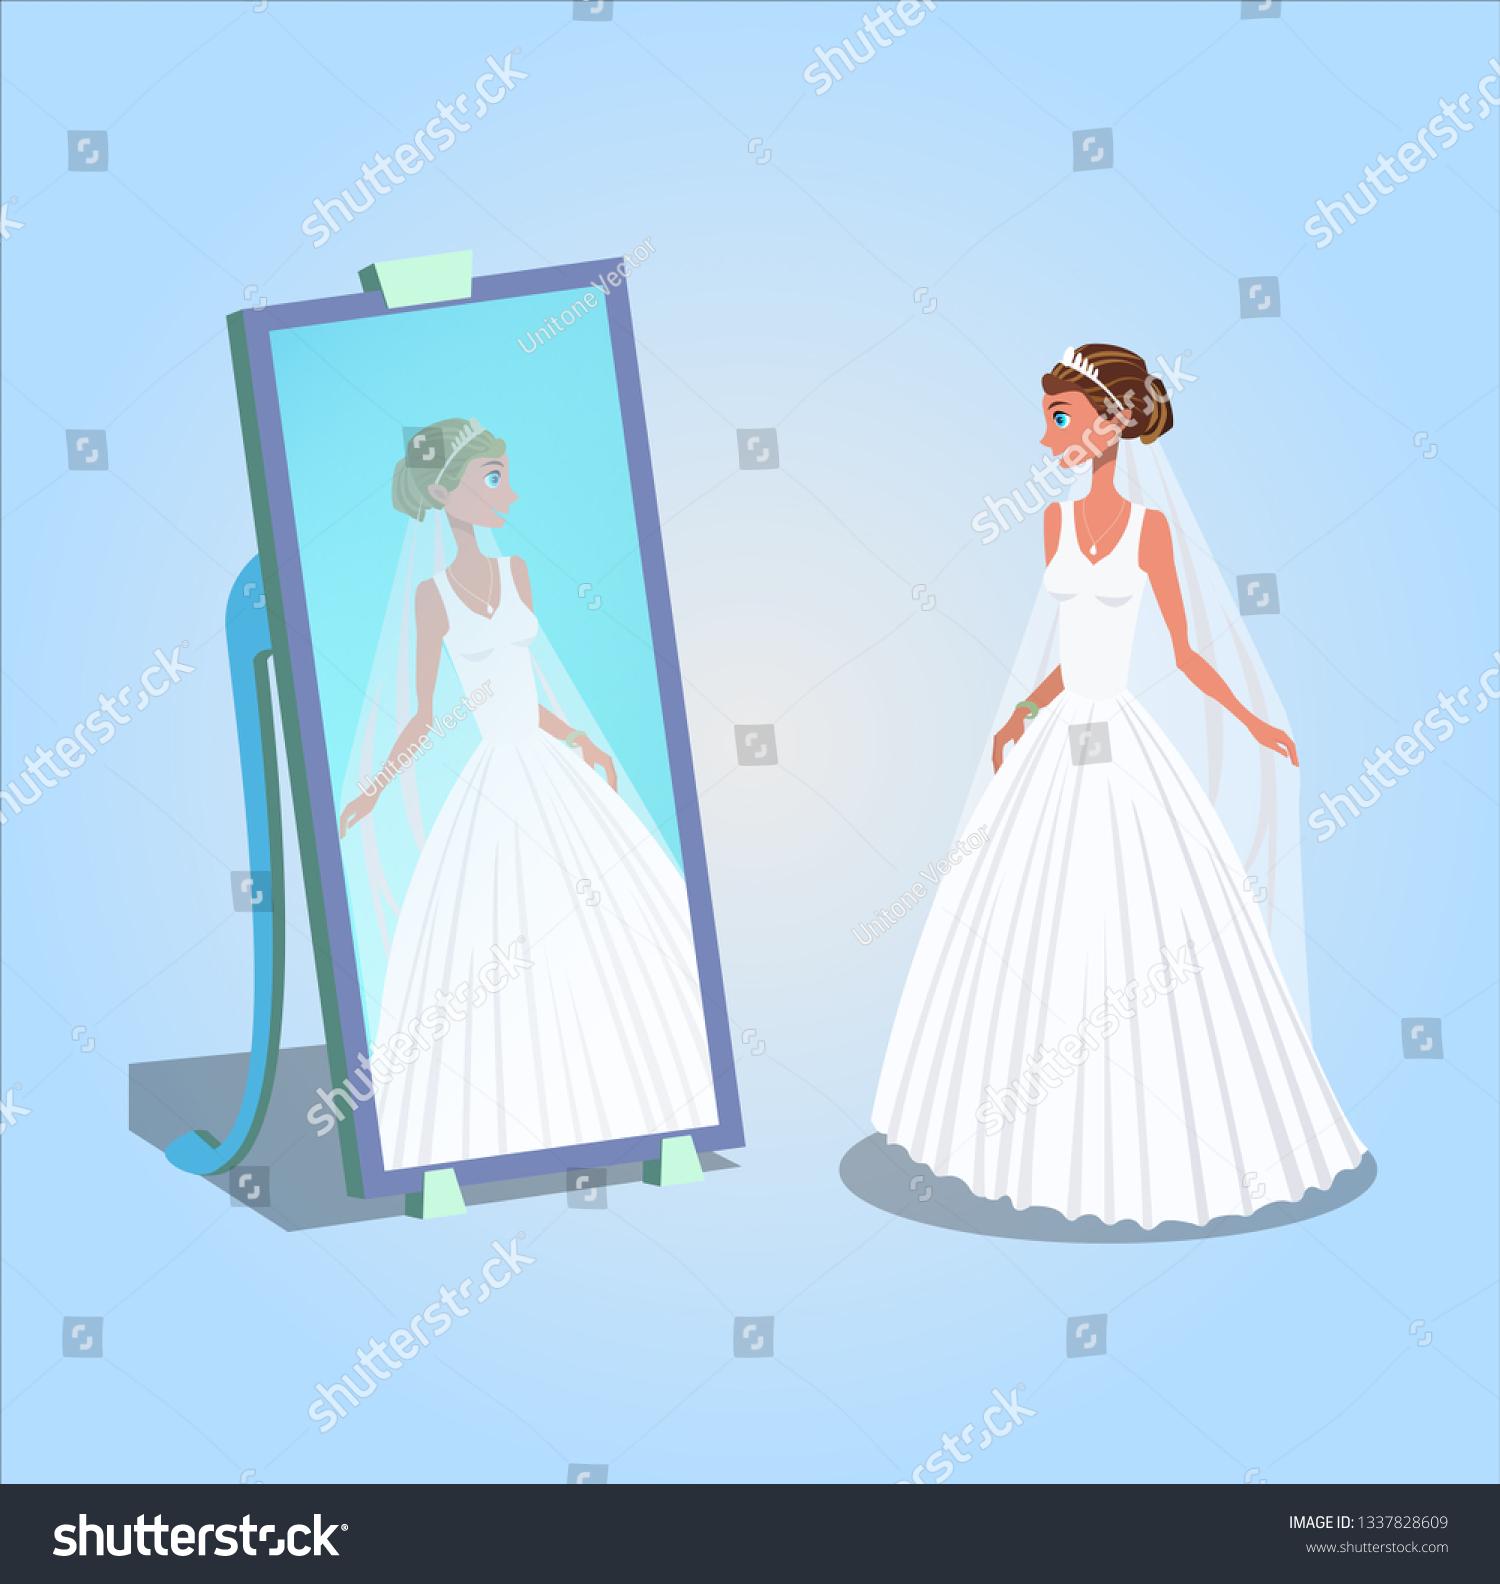 b334f761089 Young Woman in Wedding Dress Vector Illustration. Bride Looking in Mirror  Cartoon Character. Wedding